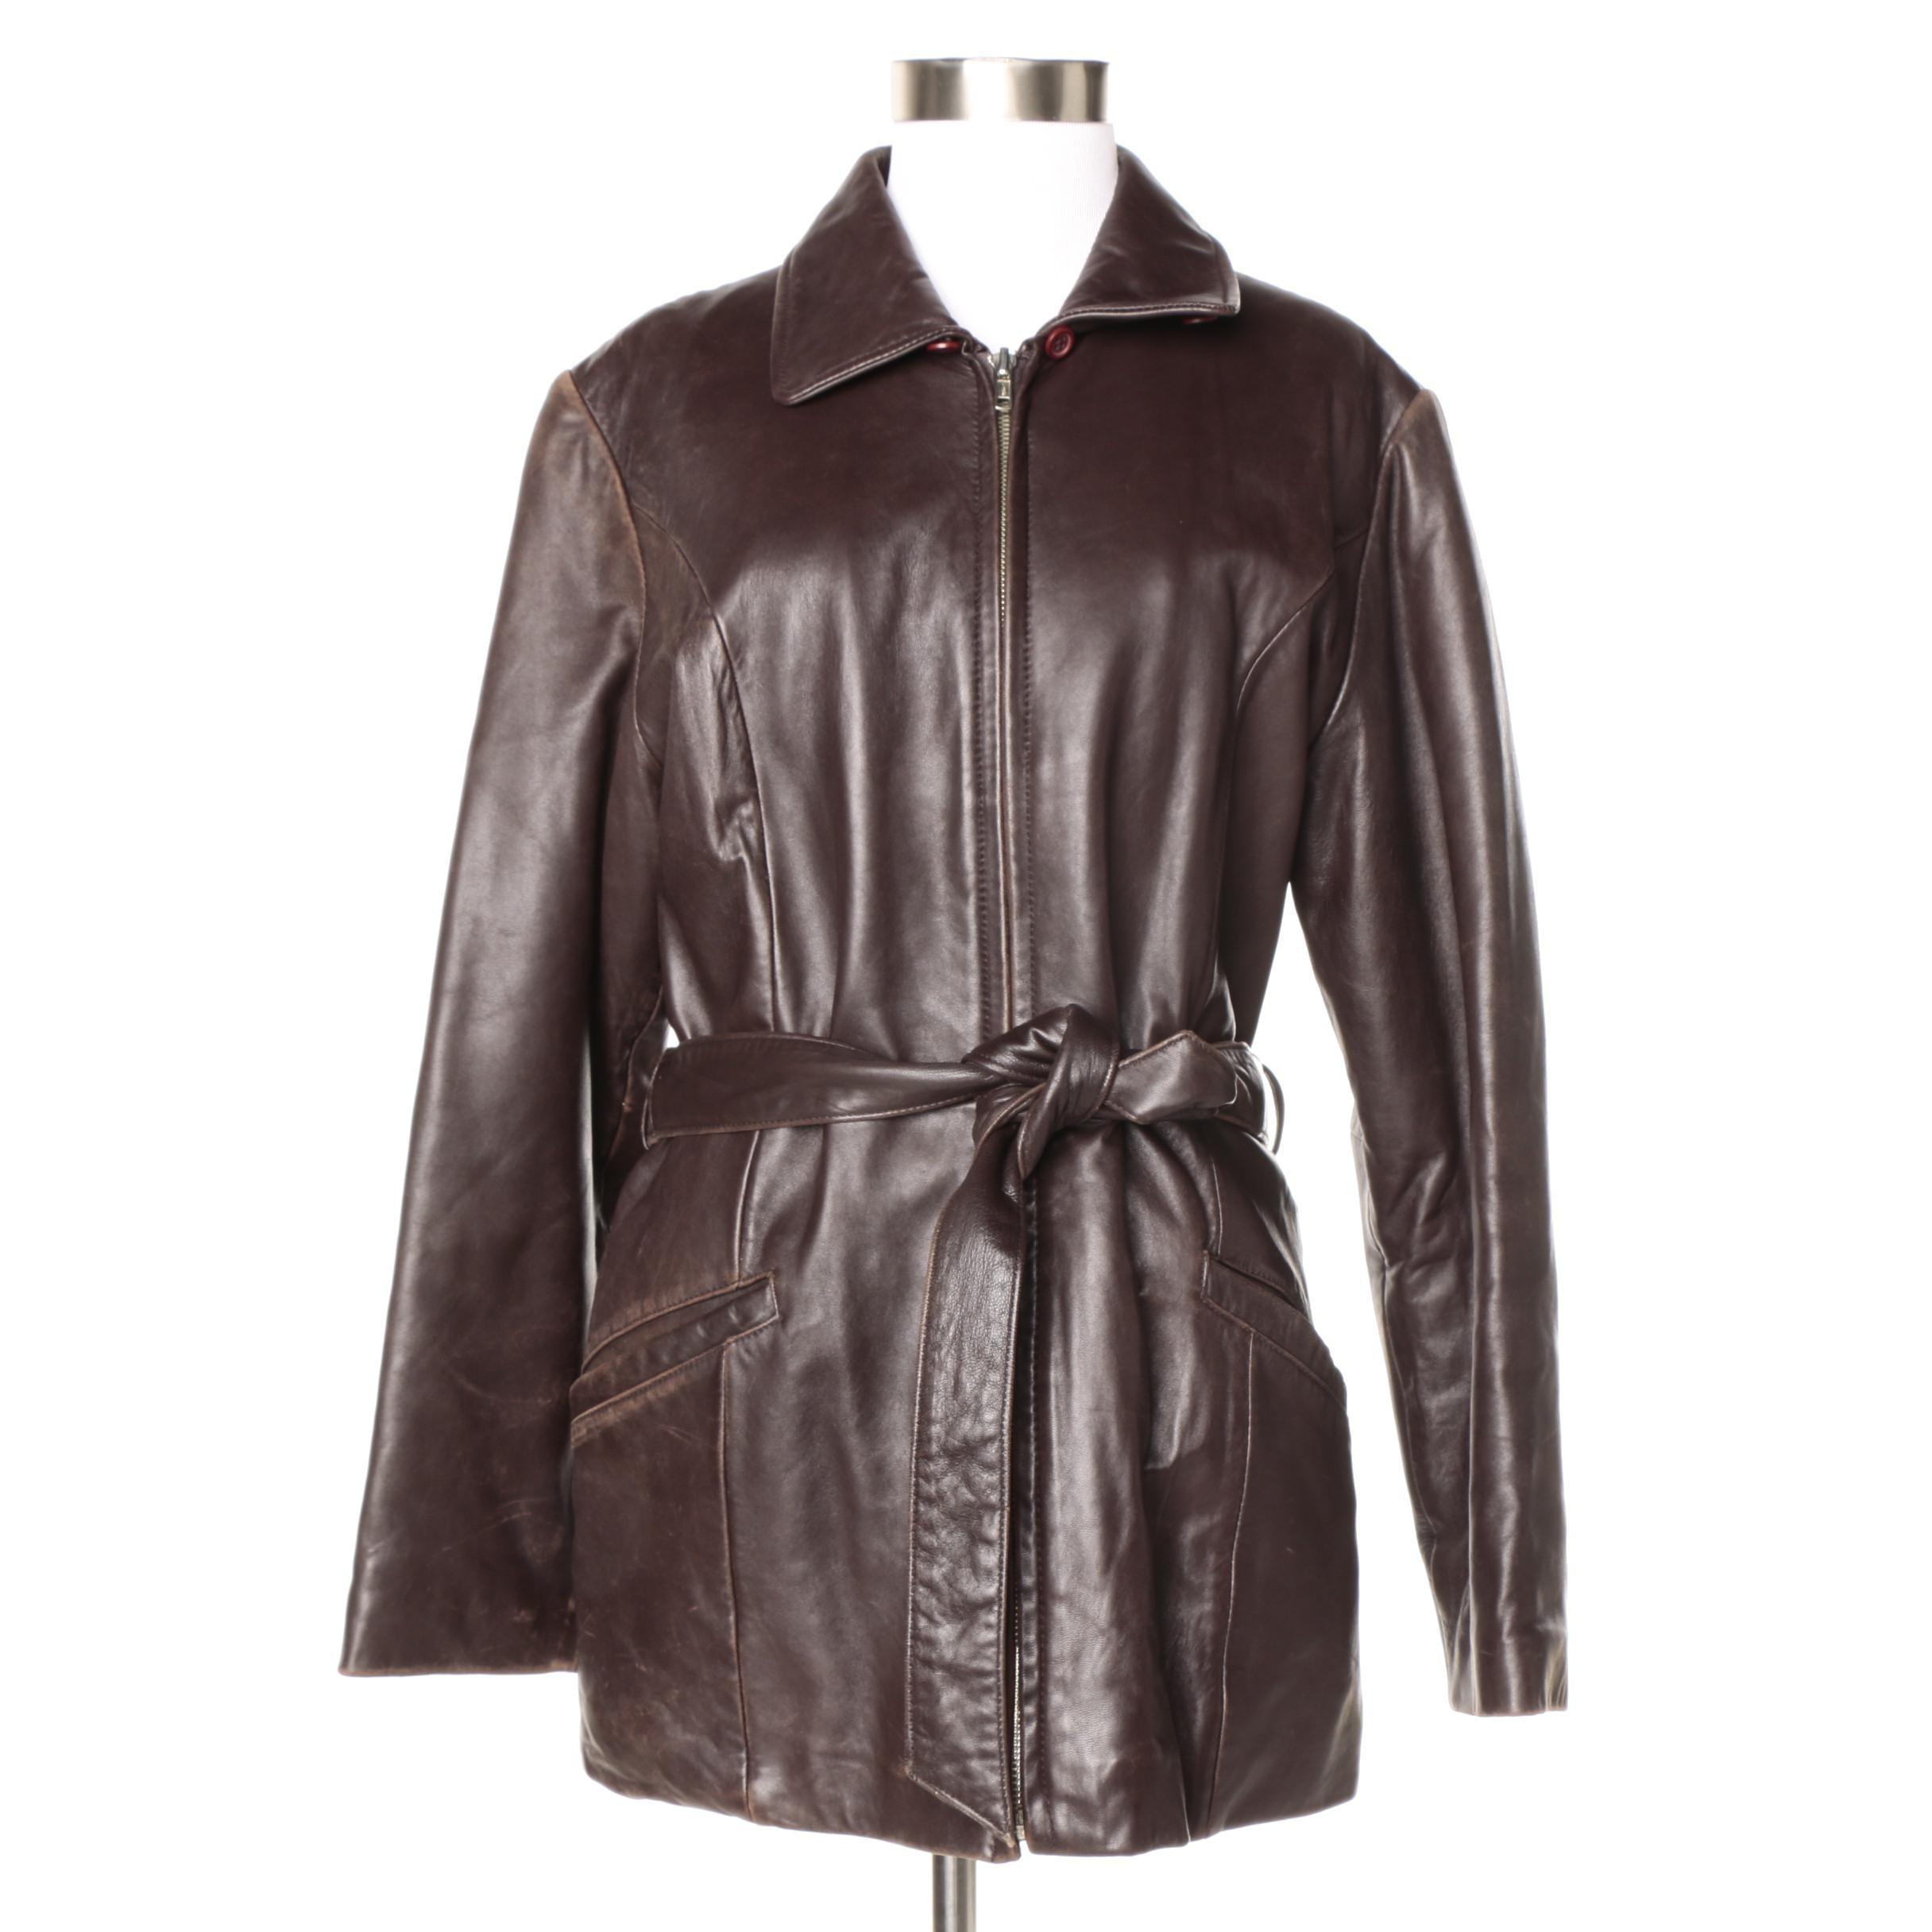 Harvé Benard Brown Leather Jacket